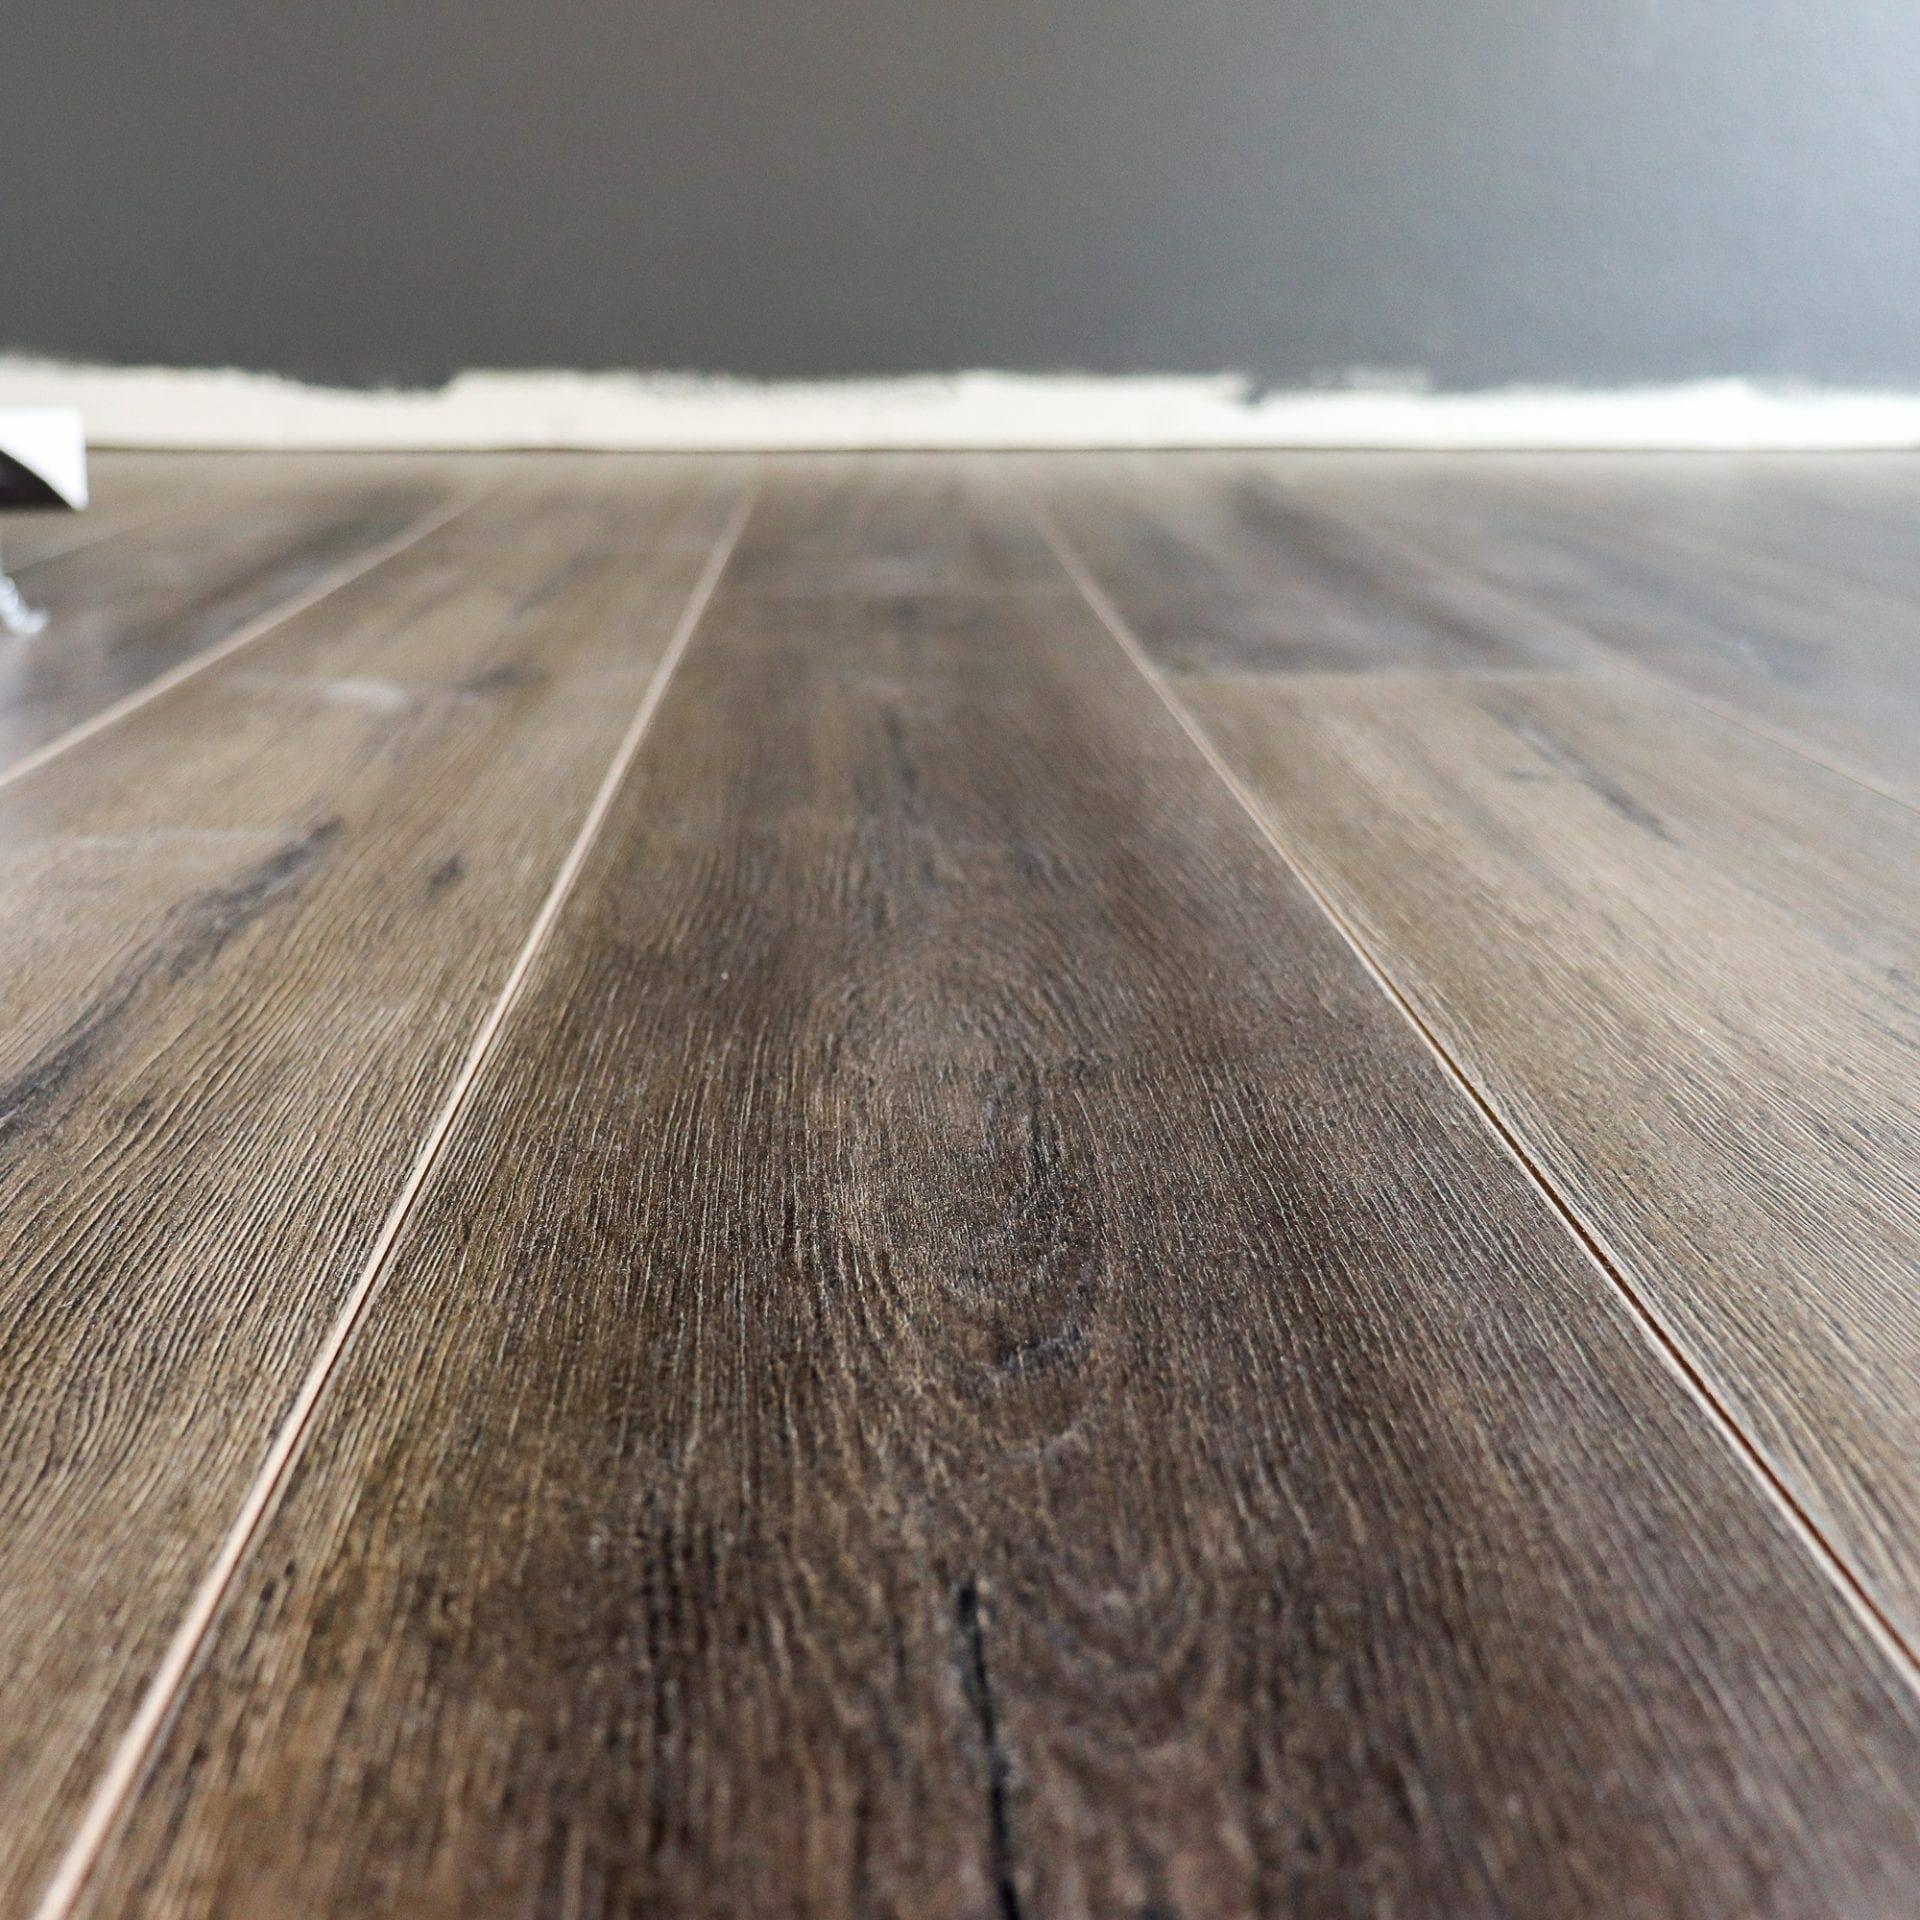 Tips for Installing Laminate Flooring Installing Laminate Flooring on parquet flooring, pergo flooring, vinyl flooring, slate flooring, tile flooring, installing pine flooring, bamboo flooring, installing sub flooring, oak flooring, engineered wood flooring, cork flooring, laminate floors, installing osb flooring, stone flooring, ceramic tile flooring, wood flooring, installing oak flooring, installing solid bamboo flooring, hardwood flooring, installing flooring product, concrete flooring, installing vinyl flooring, carpet tiles, linoleum flooring, installing cork flooring, installing pergo flooring, installing engineered flooring, installing wooden flooring, installing terrazzo flooring, installing tile, installing slate flooring, rubber flooring, installing pvc flooring, installing marmoleum flooring, installing maple flooring, installing lvt flooring, marble flooring,